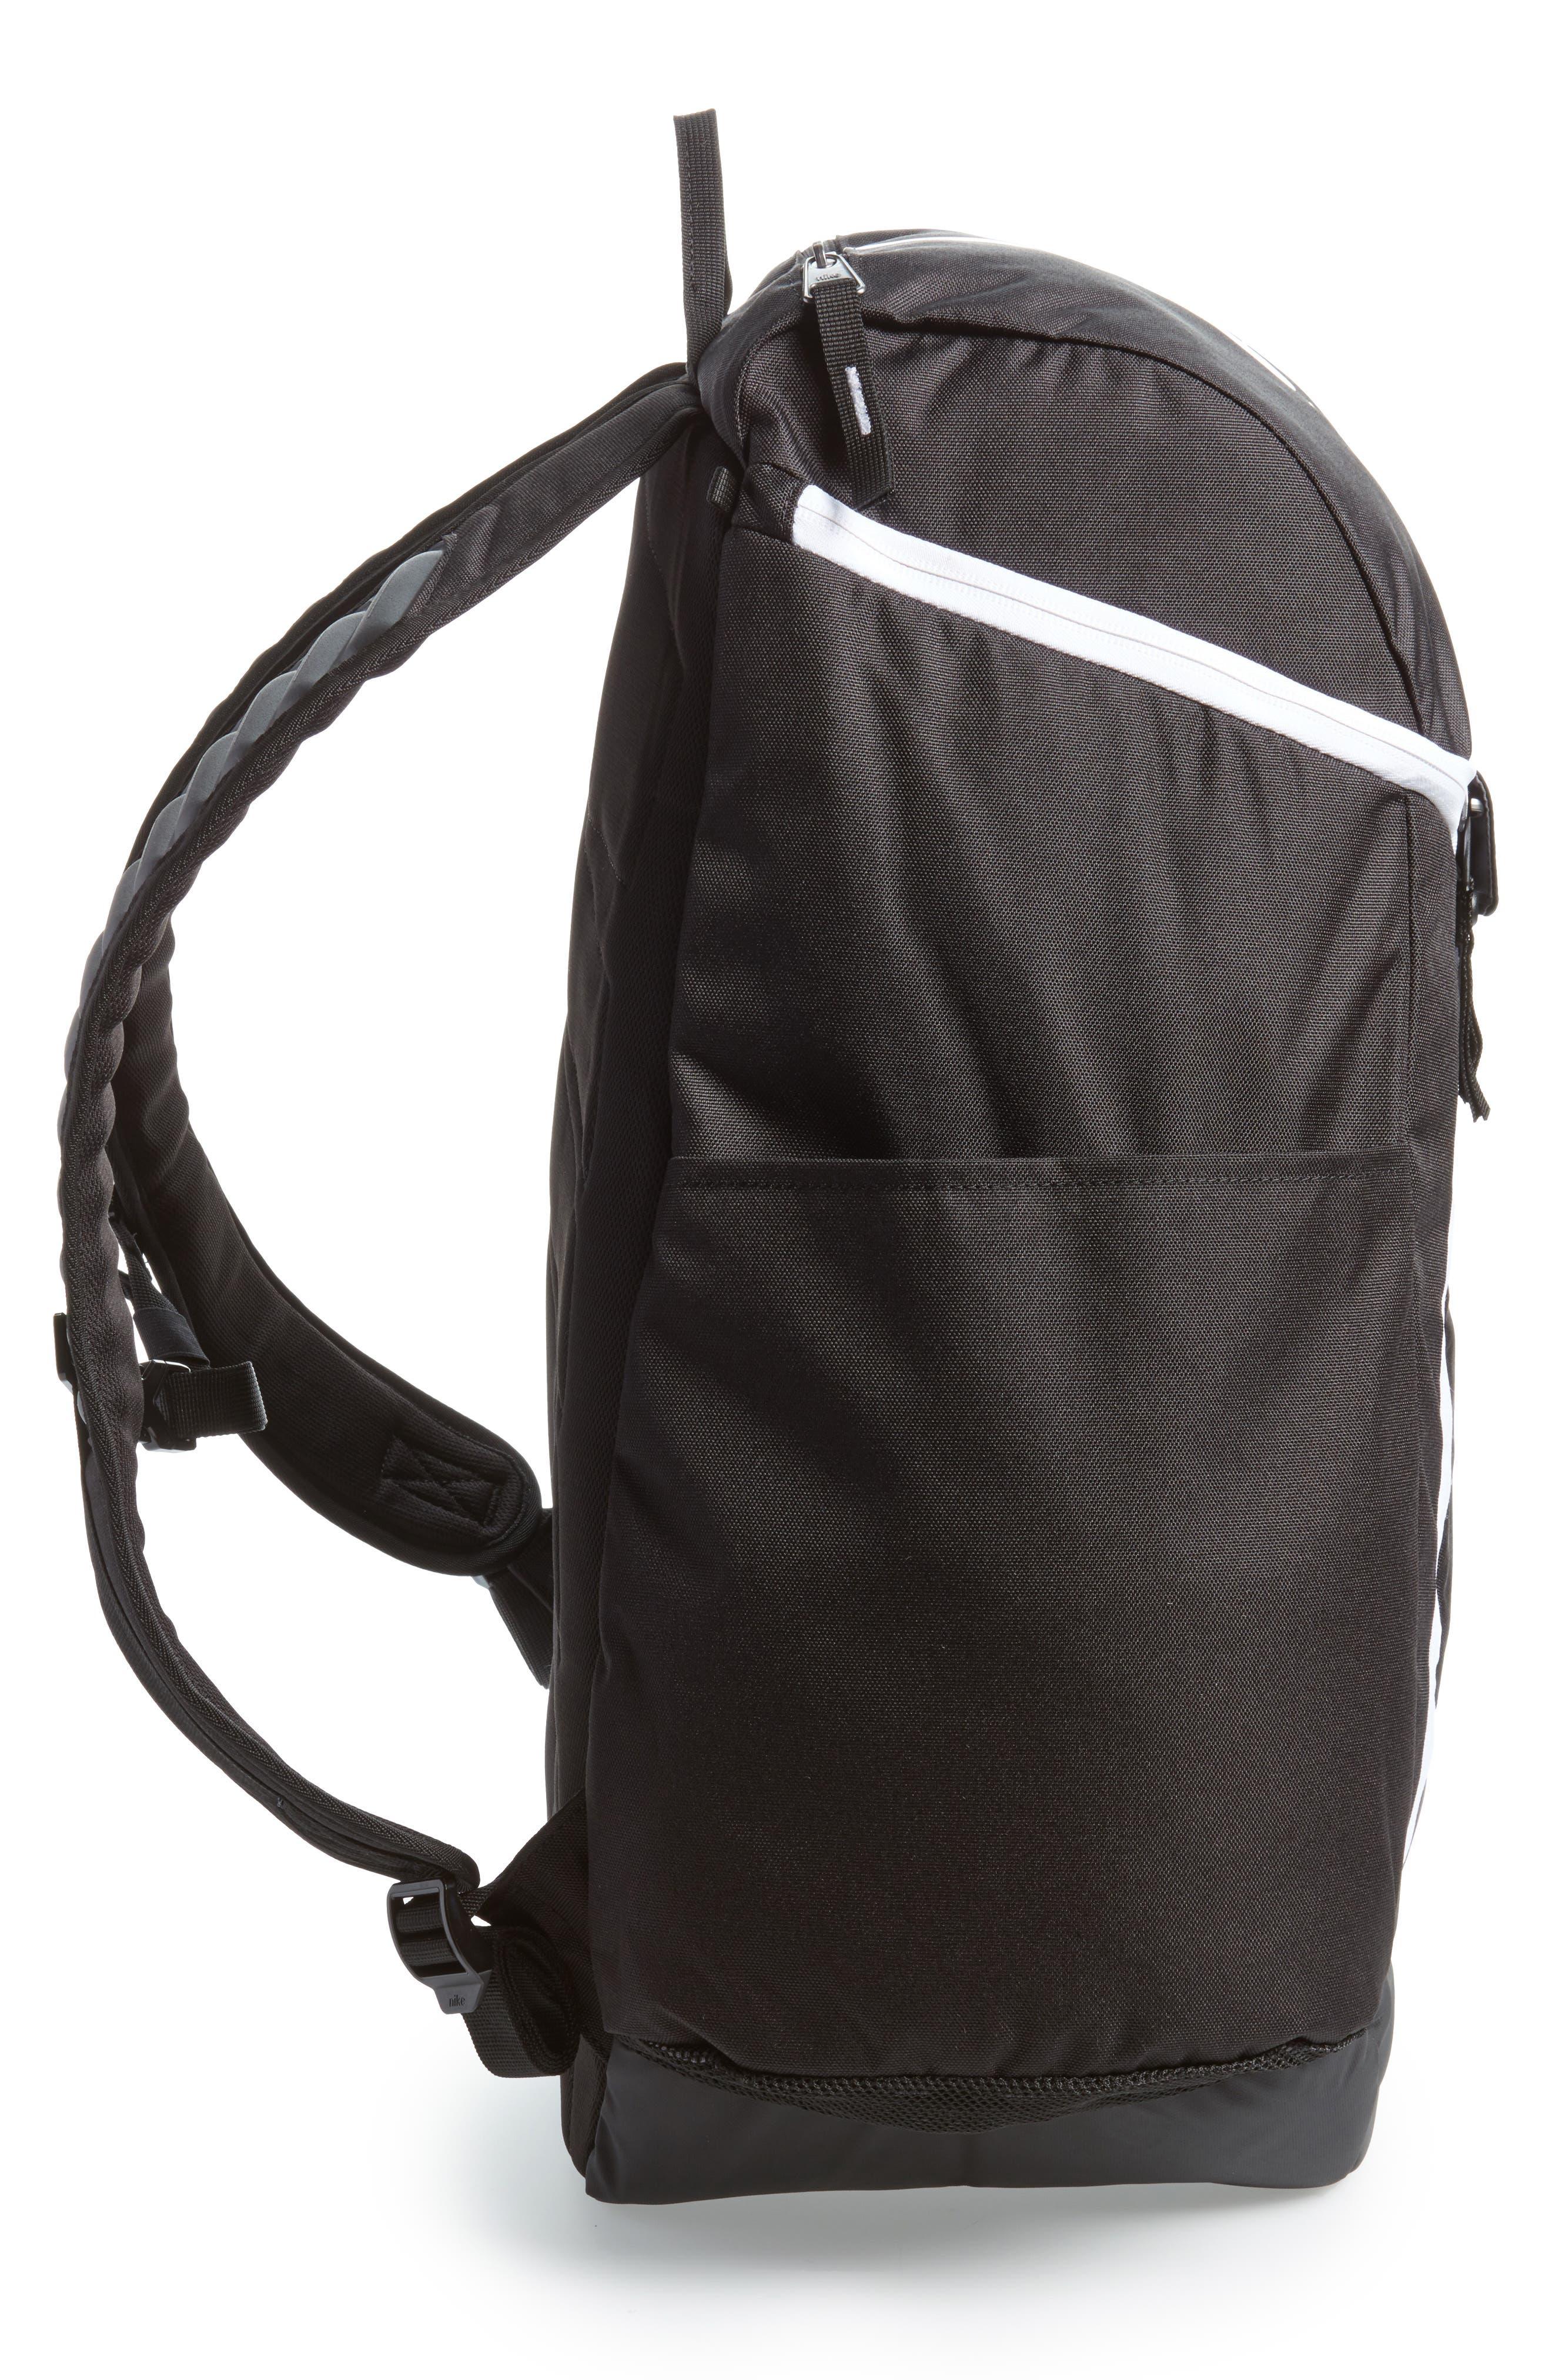 Hoops Elite Max Air Team Backpack,                             Alternate thumbnail 4, color,                             Black / White